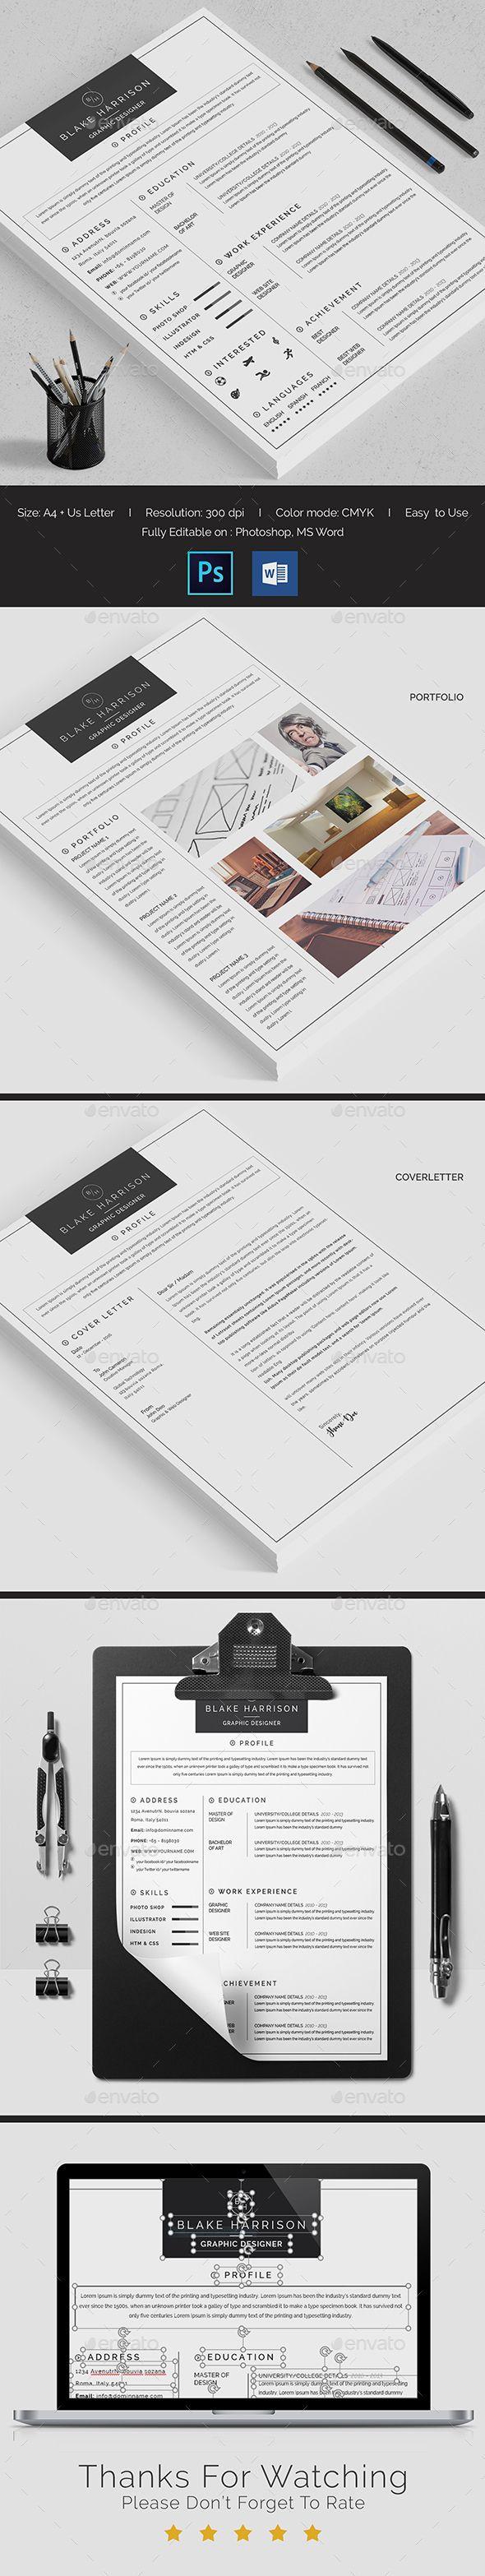 Resume — Photoshop PSD #curriculum vitae #feature design • Download ➝ https://graphicriver.net/item/resume/20051725?ref=pxcr